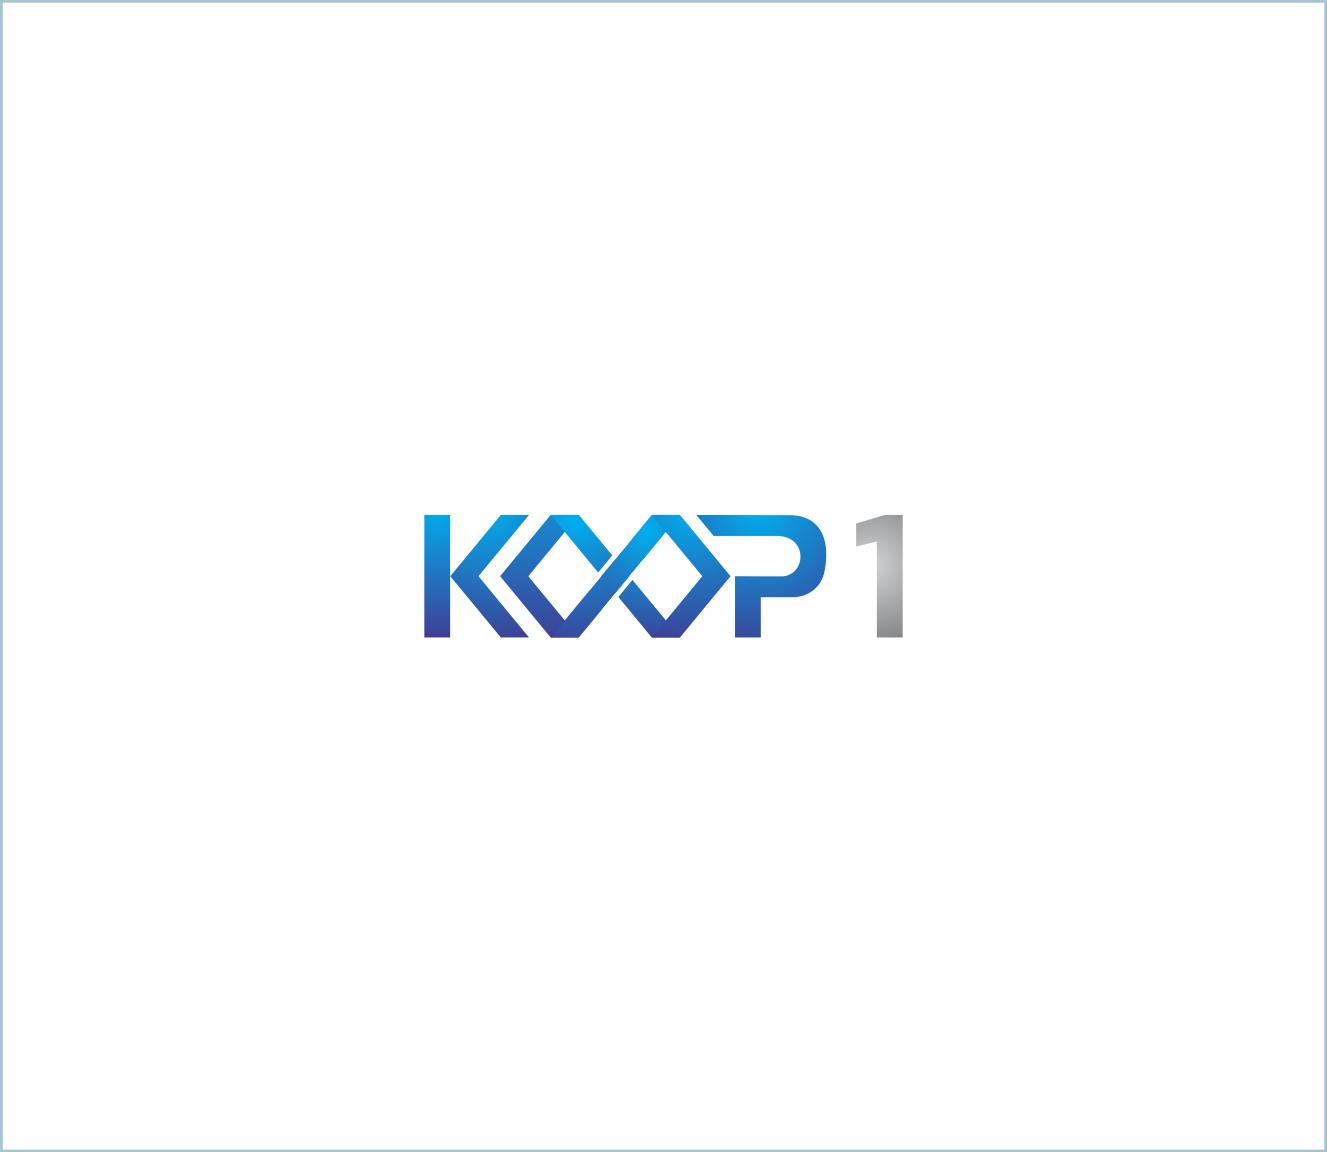 Logo Design by Armada Jamaluddin - Entry No. 195 in the Logo Design Contest Creative Logo Design for KOOP 1.